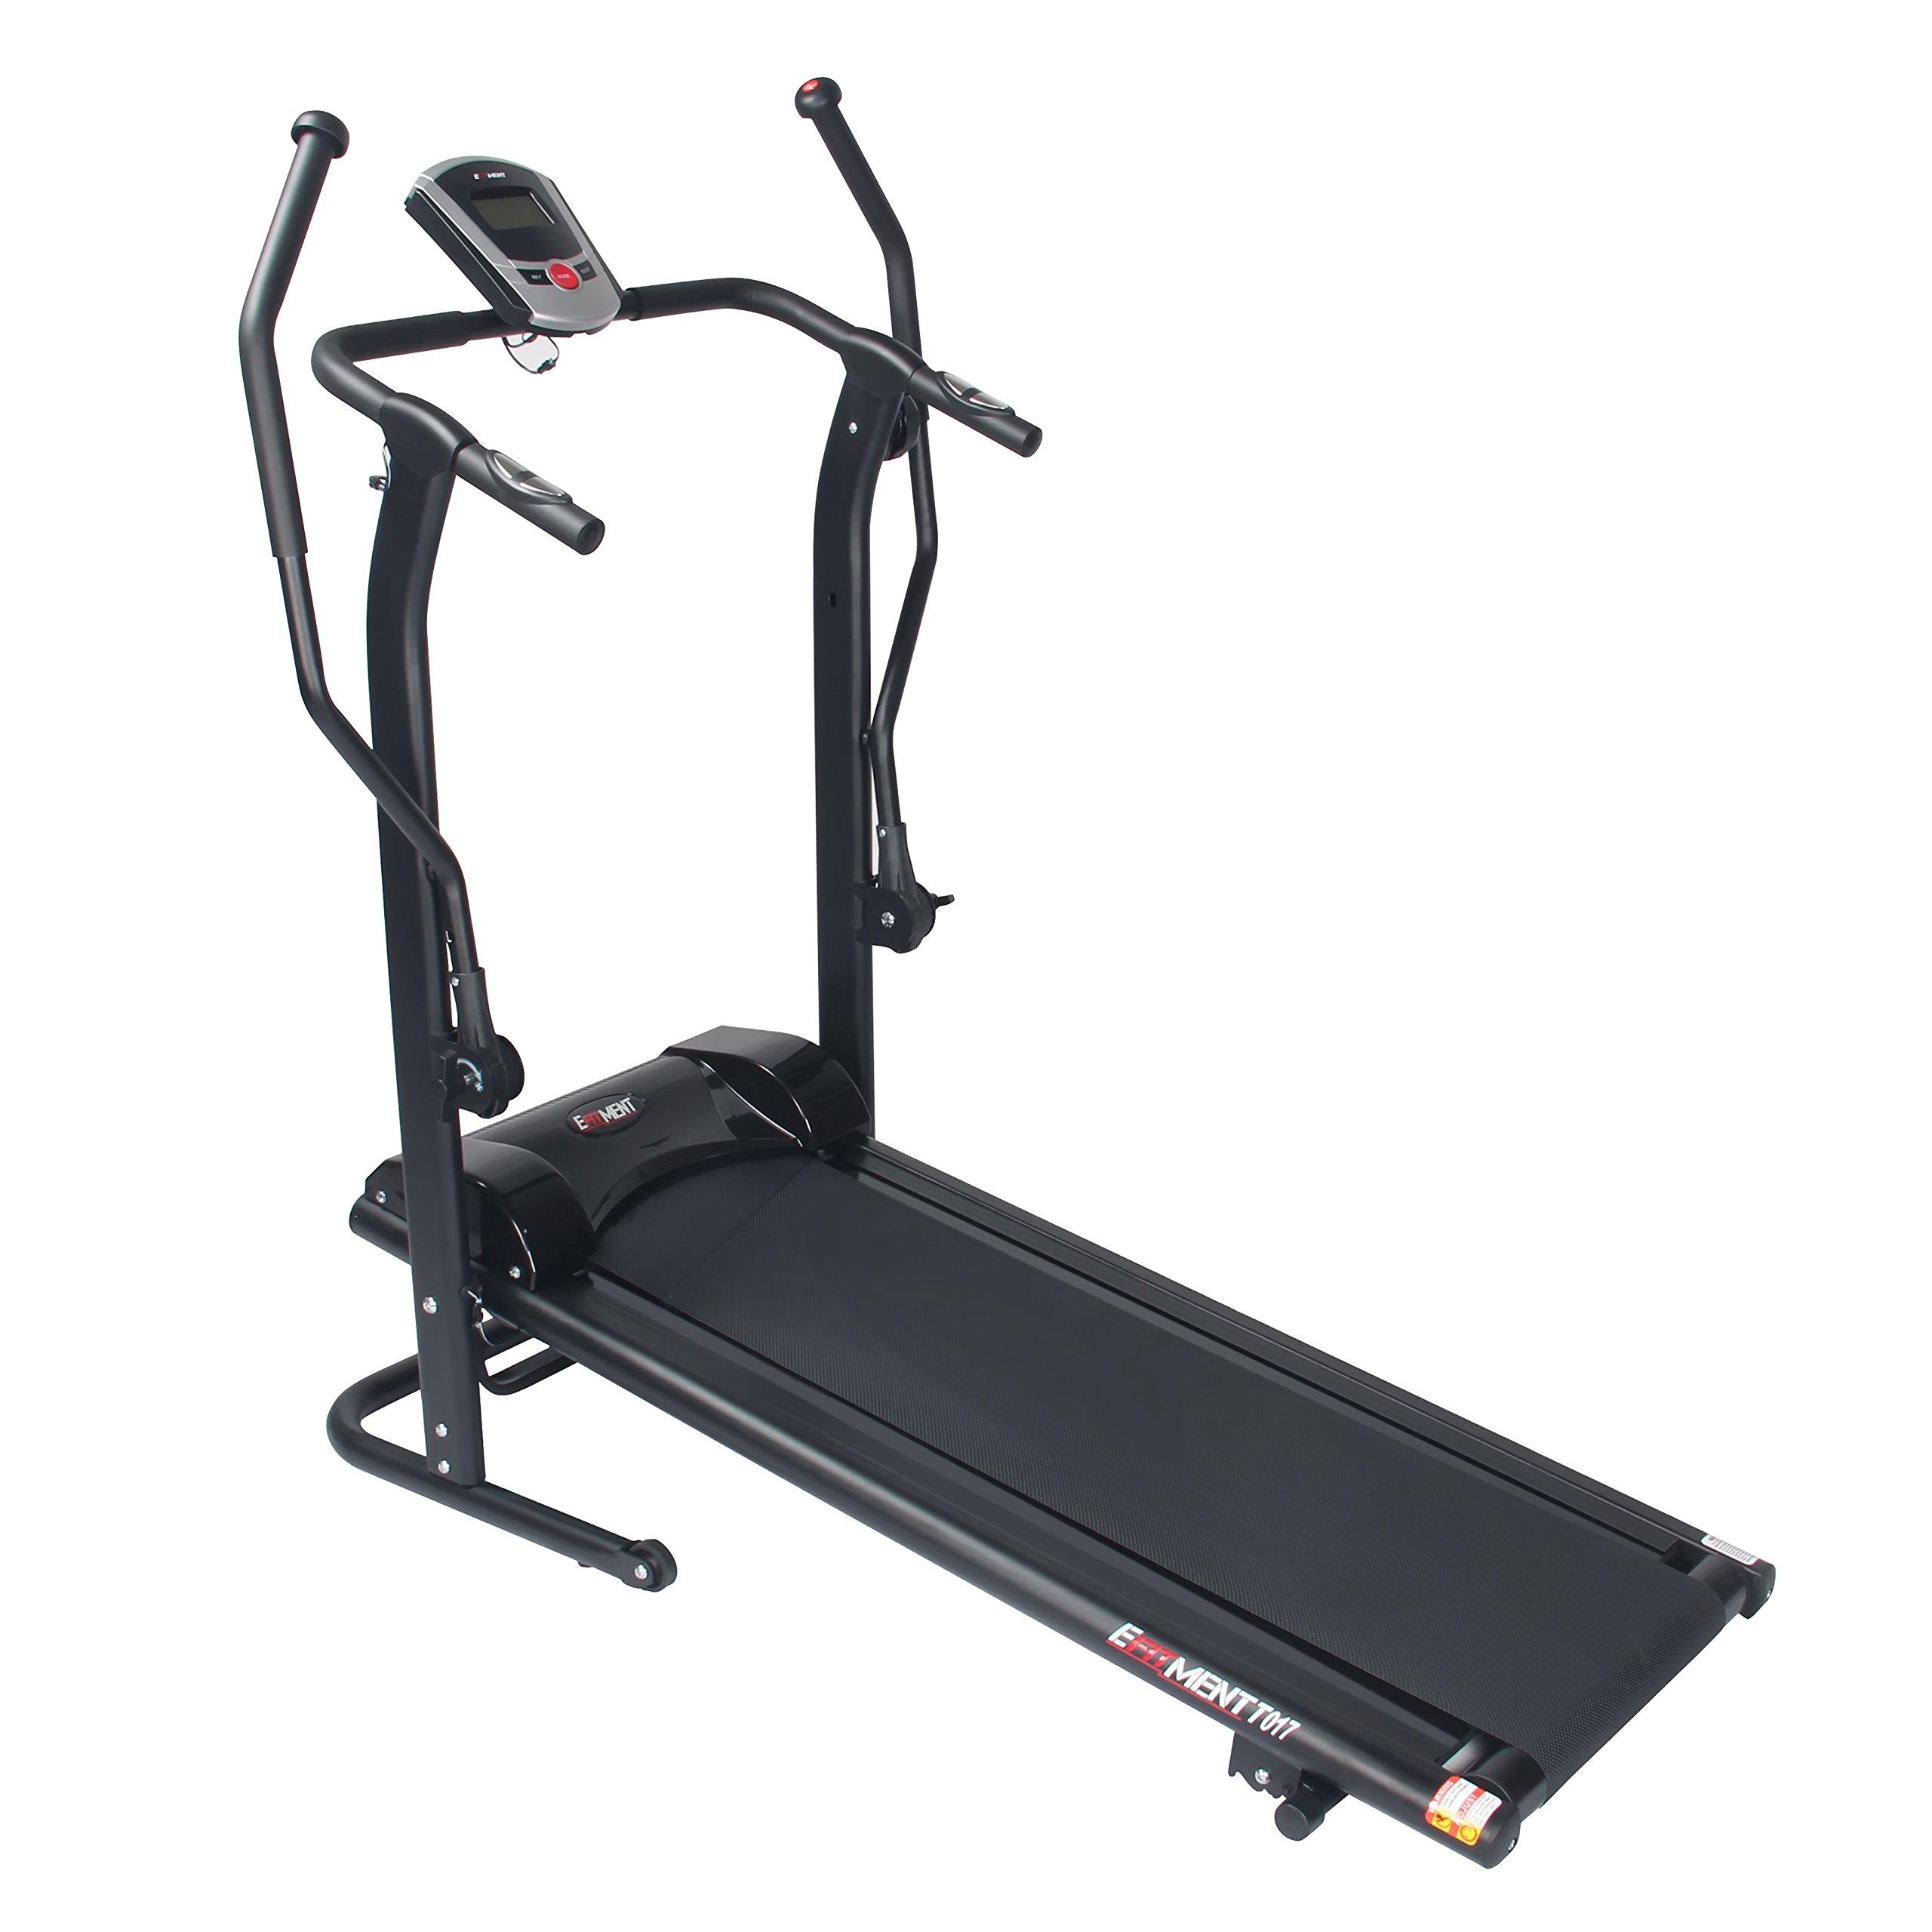 EFITMENT Adjustable Magnetic Treadmill Exercisers